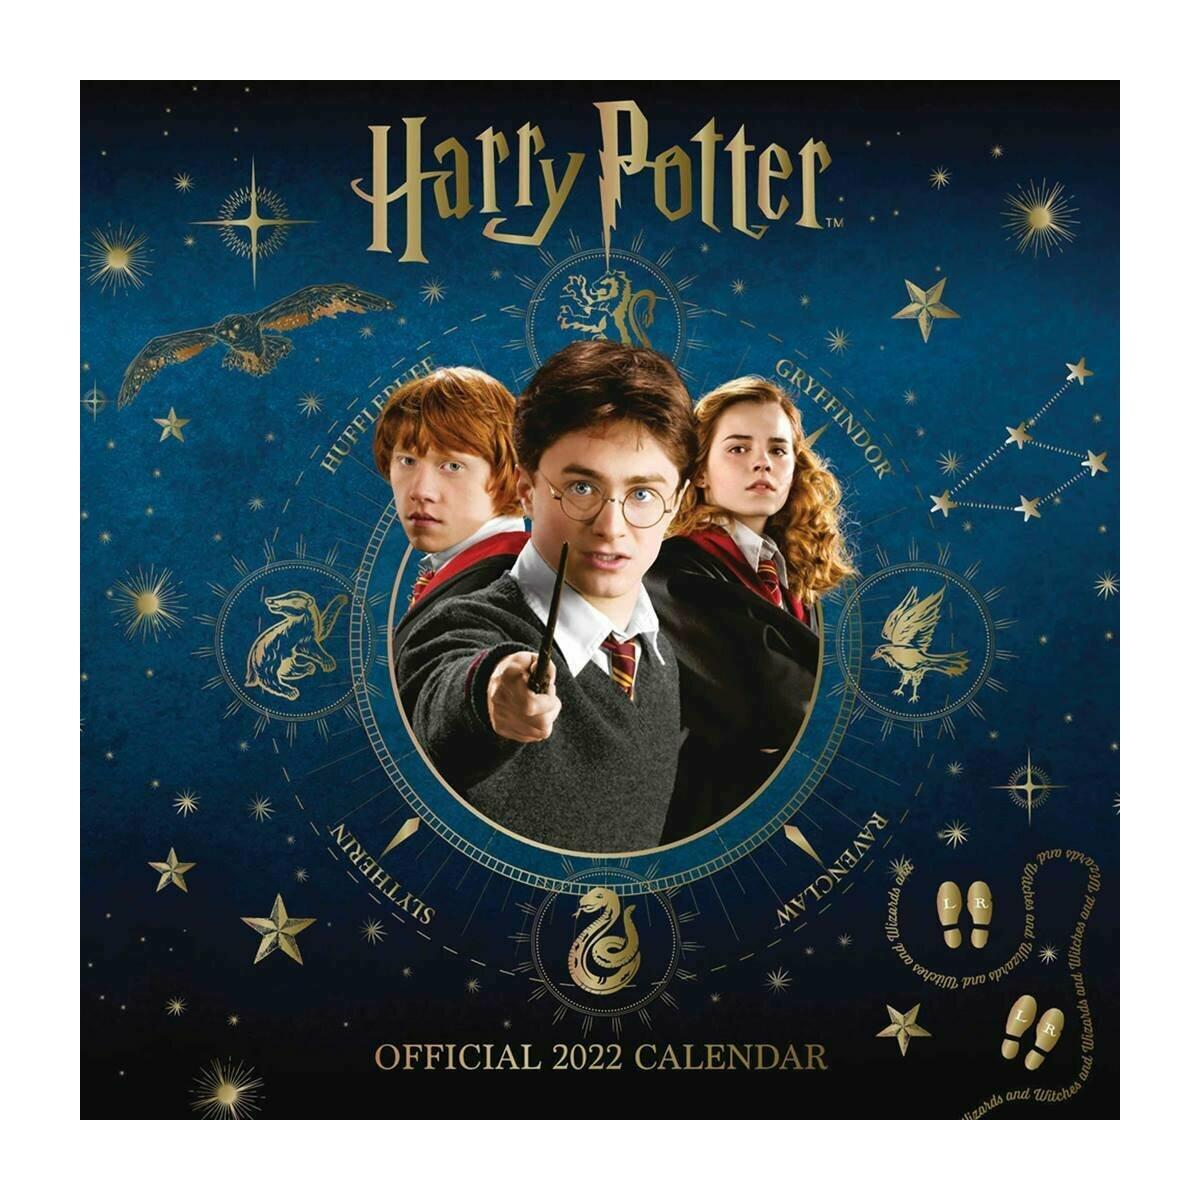 Calendrier 2022 Harry Potter Calendrier 2022 harry potter